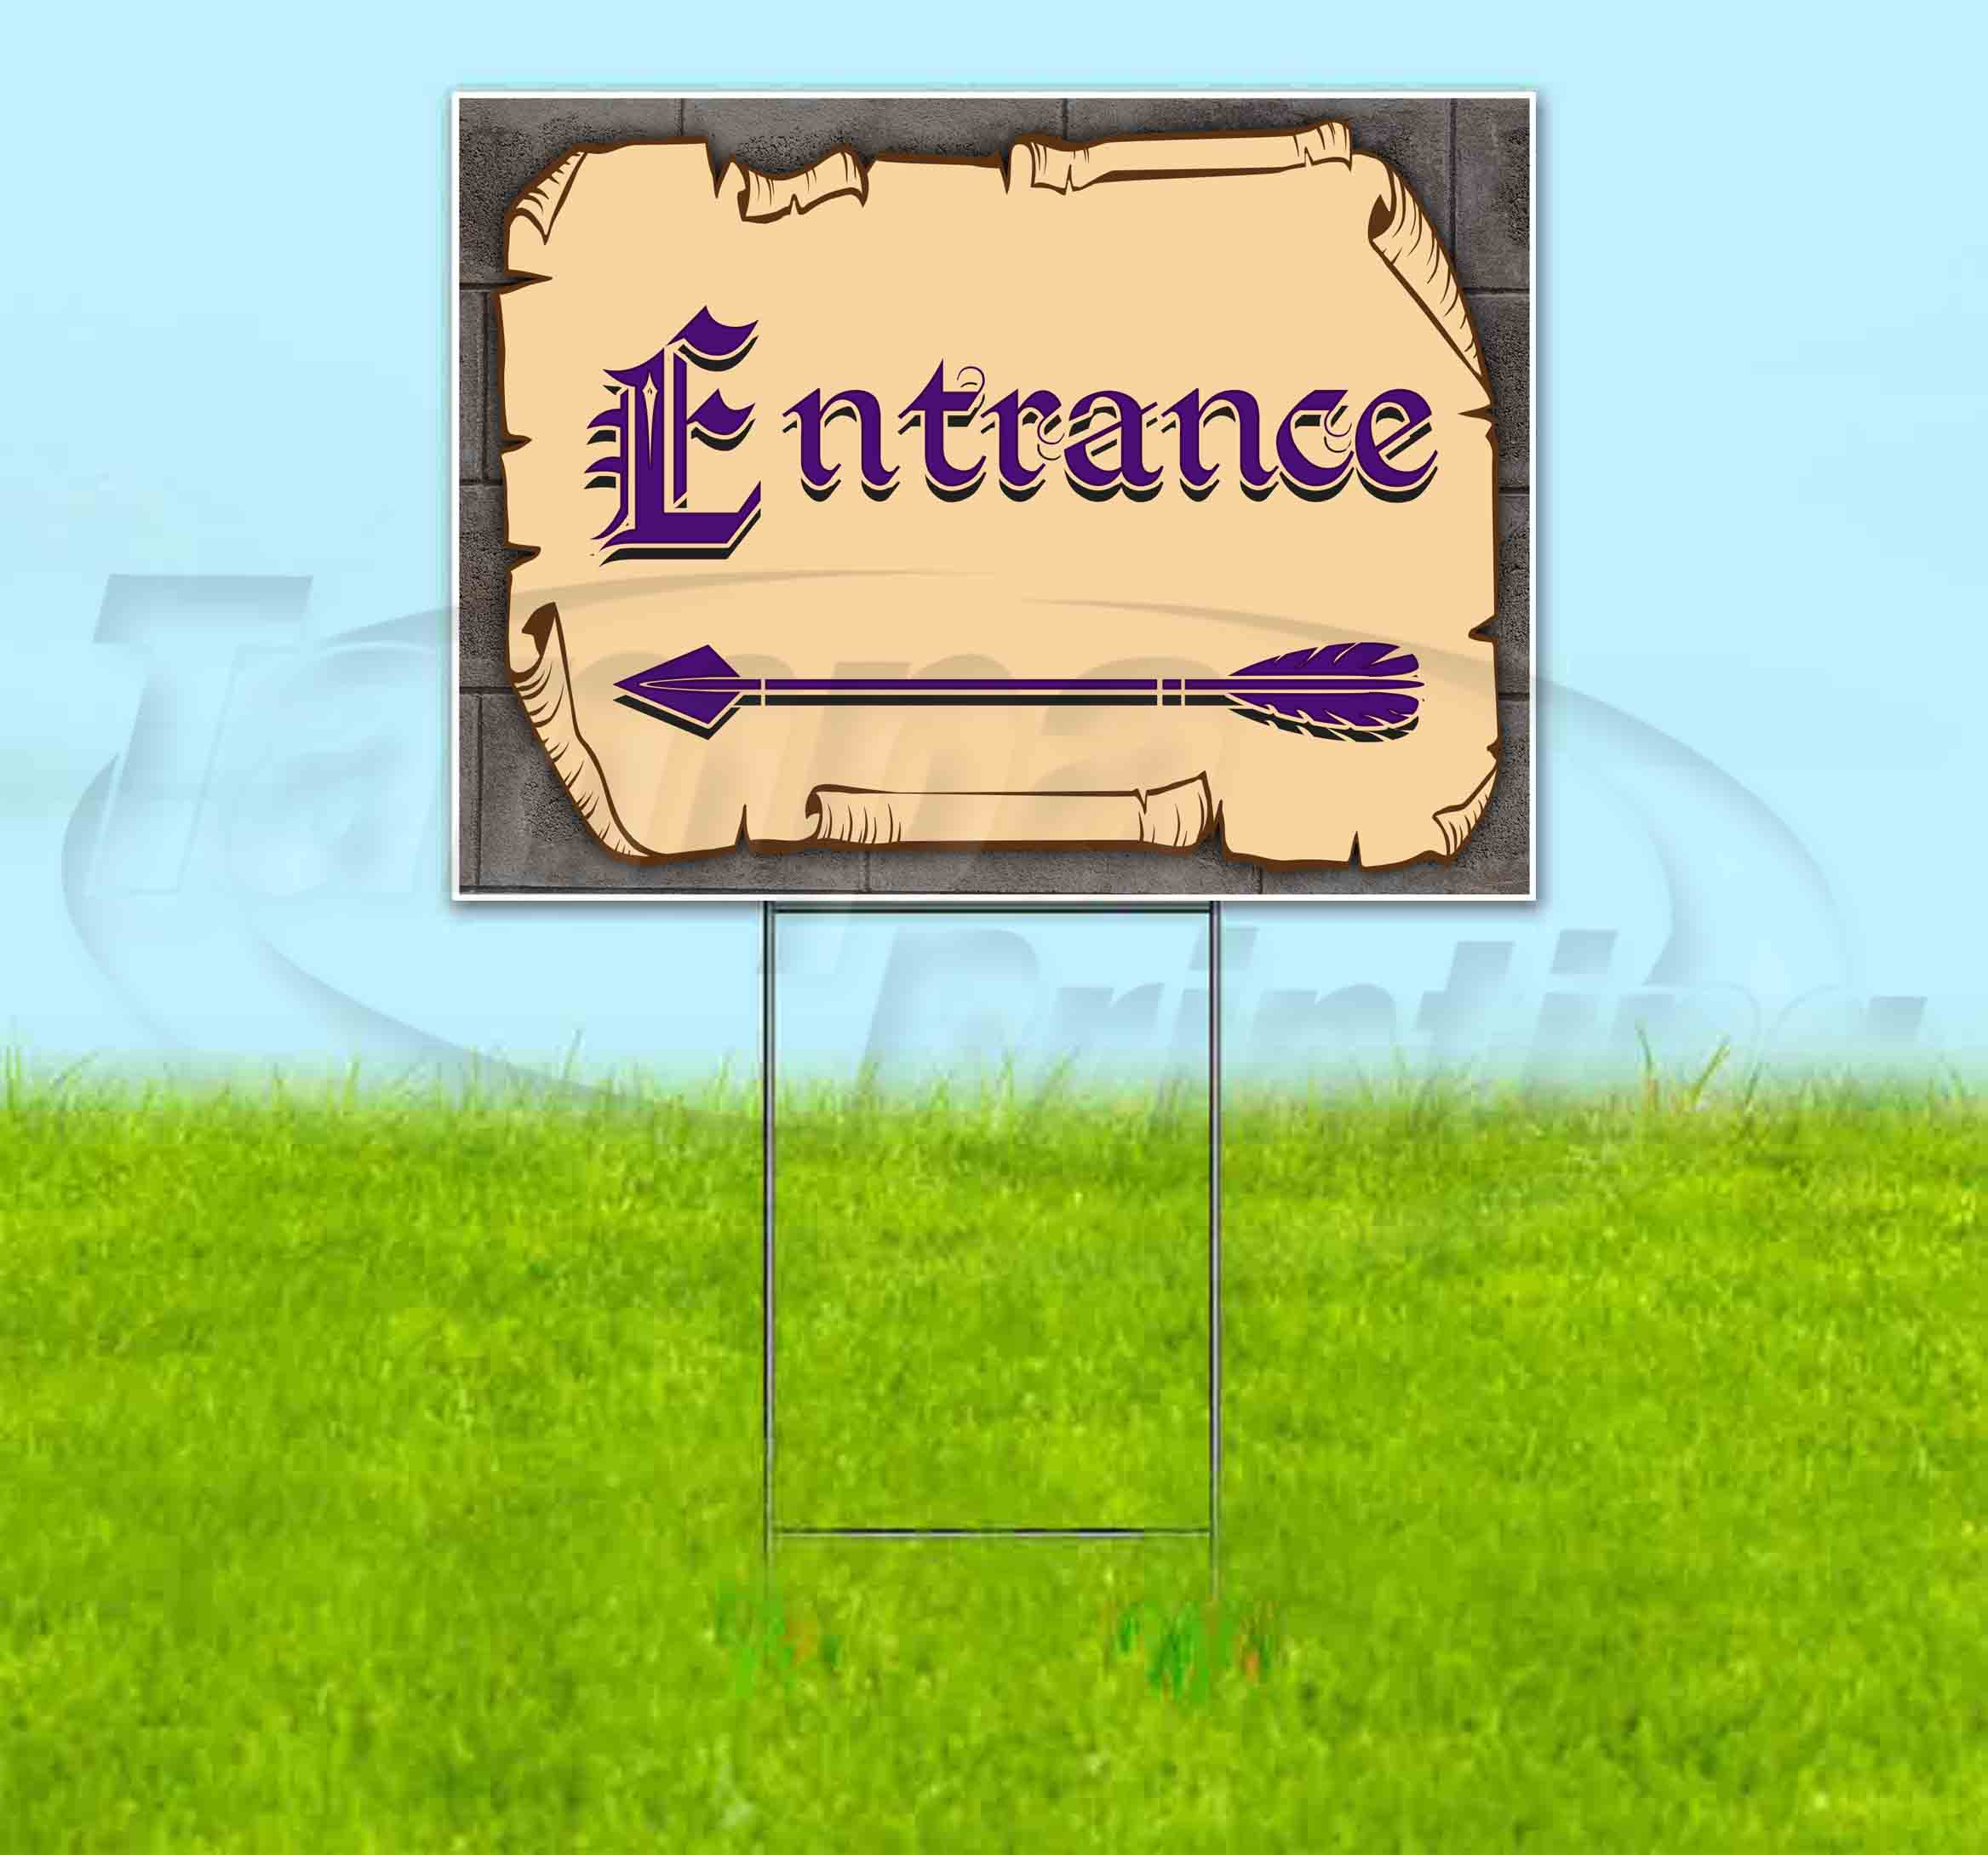 ENTRANCE LEFT ARROW Yard Sign Corrugated Plastic Bandit Lawn Decoration USA